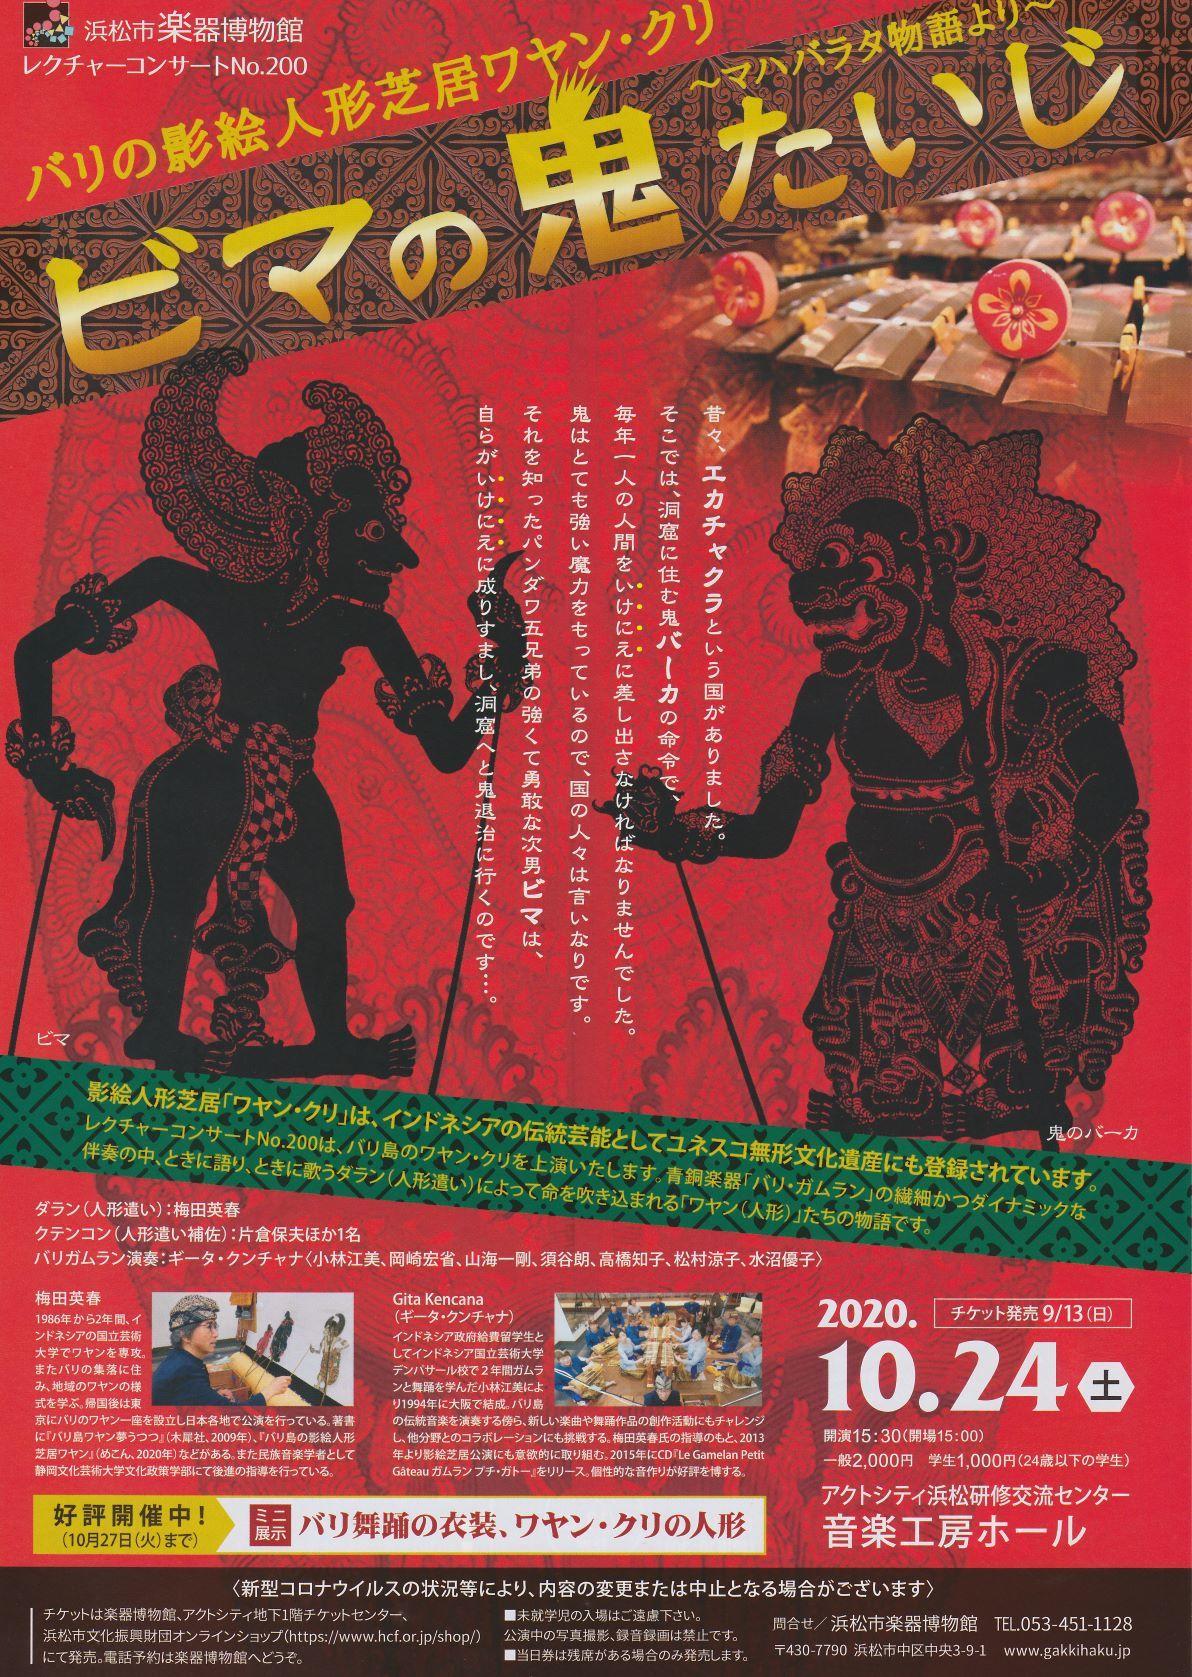 浜松市楽器博物館での影絵芝居公演_e0017689_20161278.jpg